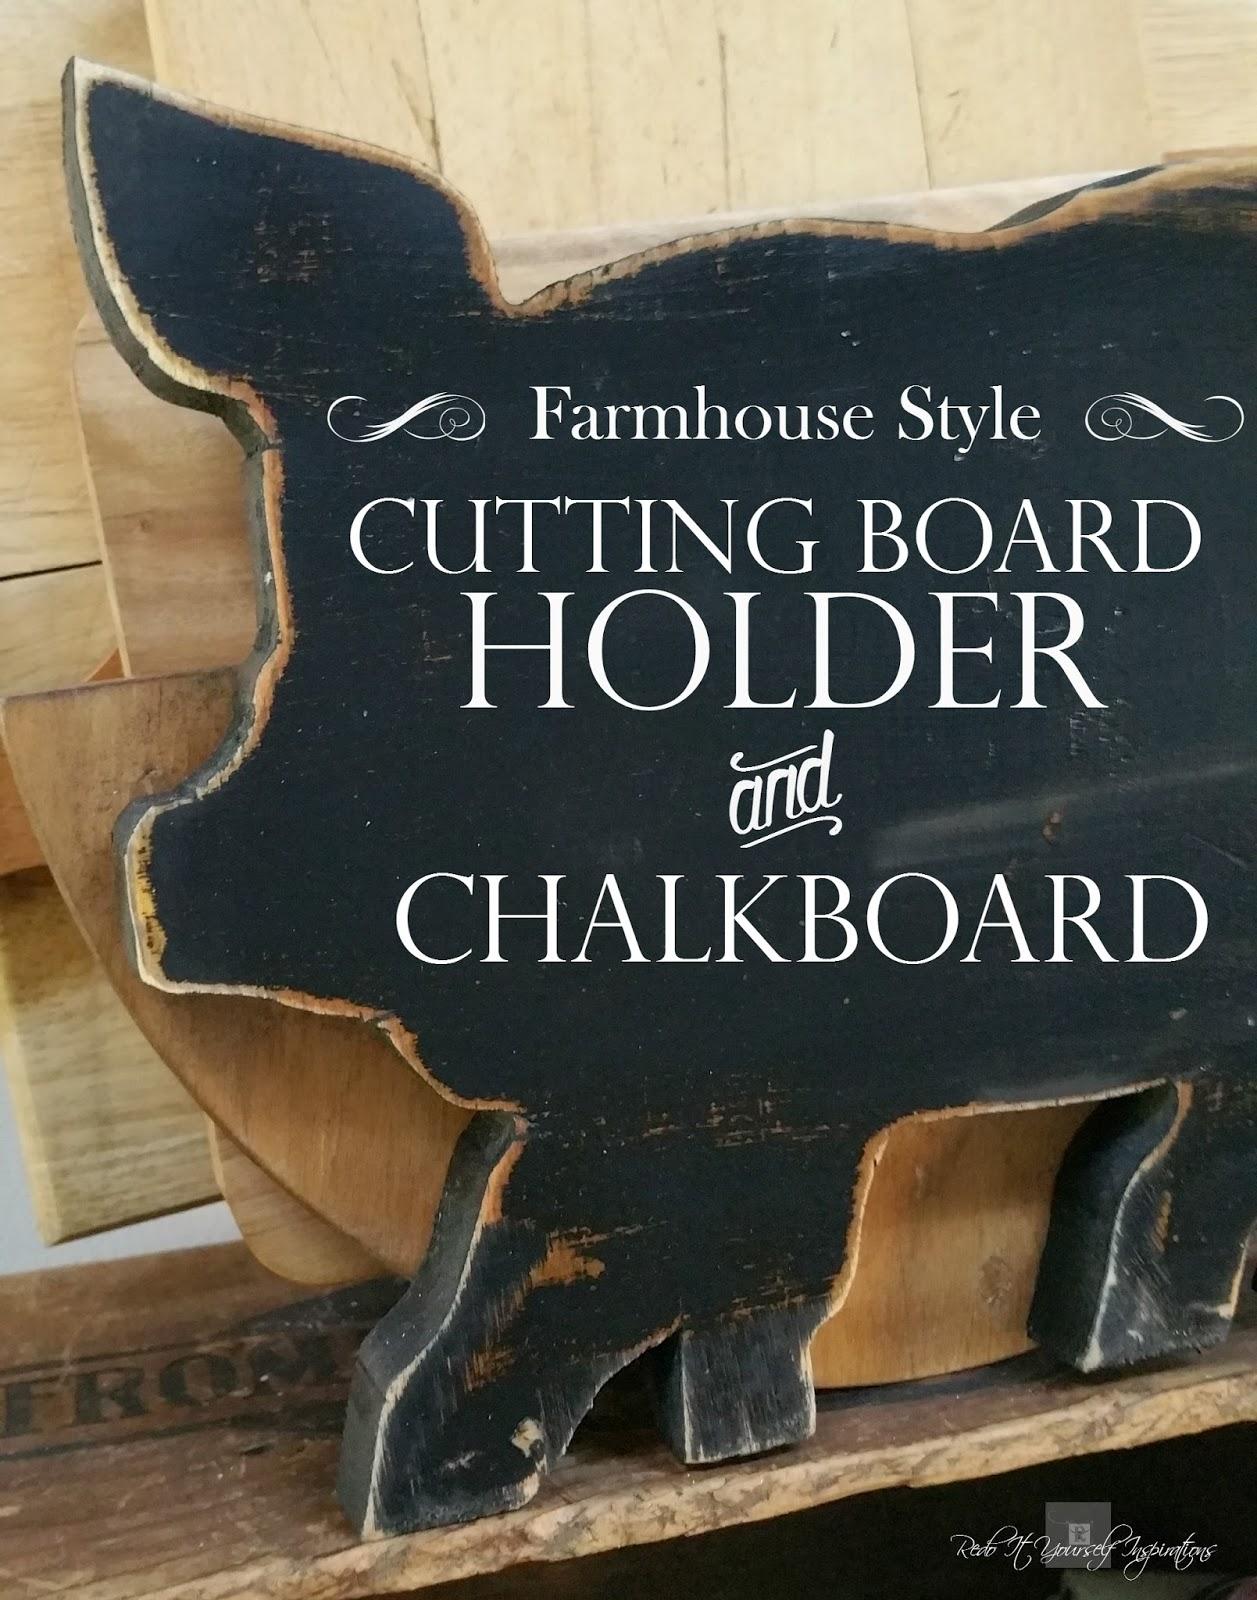 farm style cutting board holder redo it yourself inspirations rh redoityourselfinspirations blogspot com